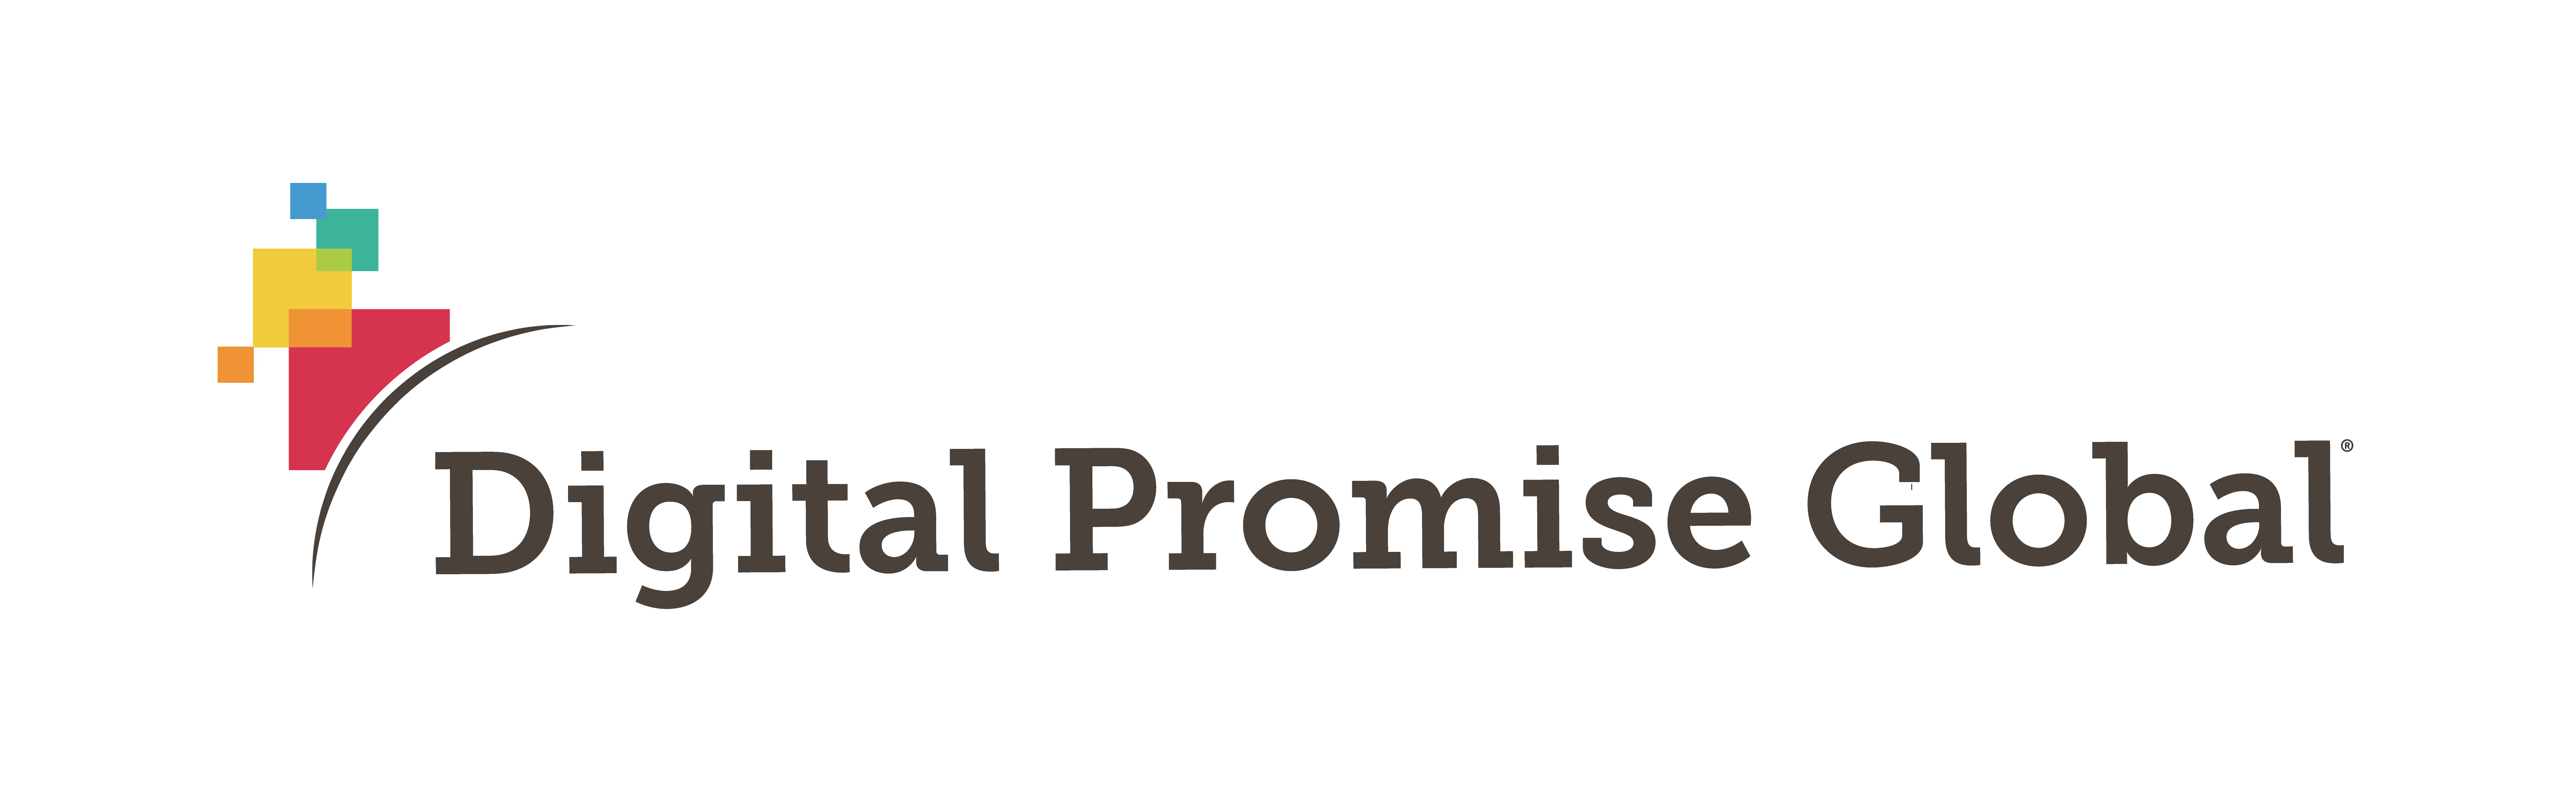 Digital Promise Global icon